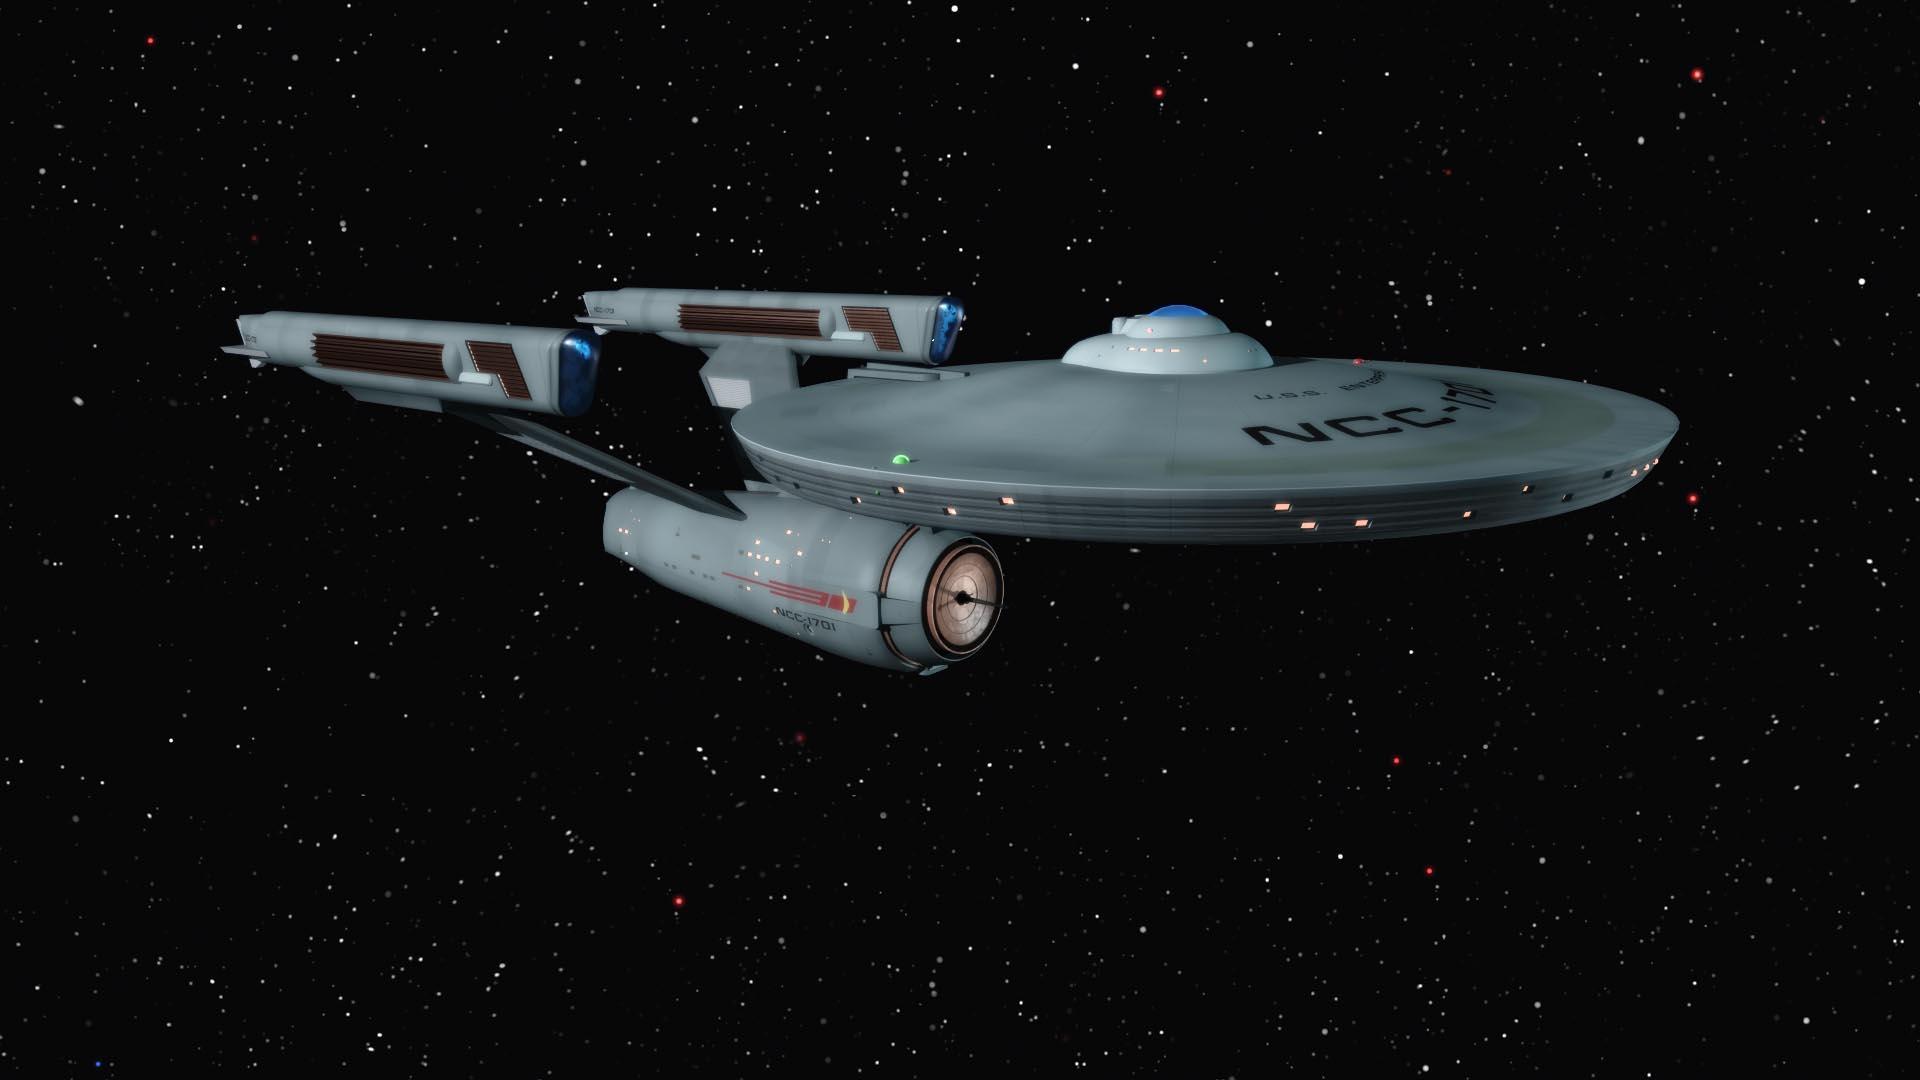 star trek uss enterprise 1080x1920 Wallpaper HDTV Desktop Wallpaper 1920x1080